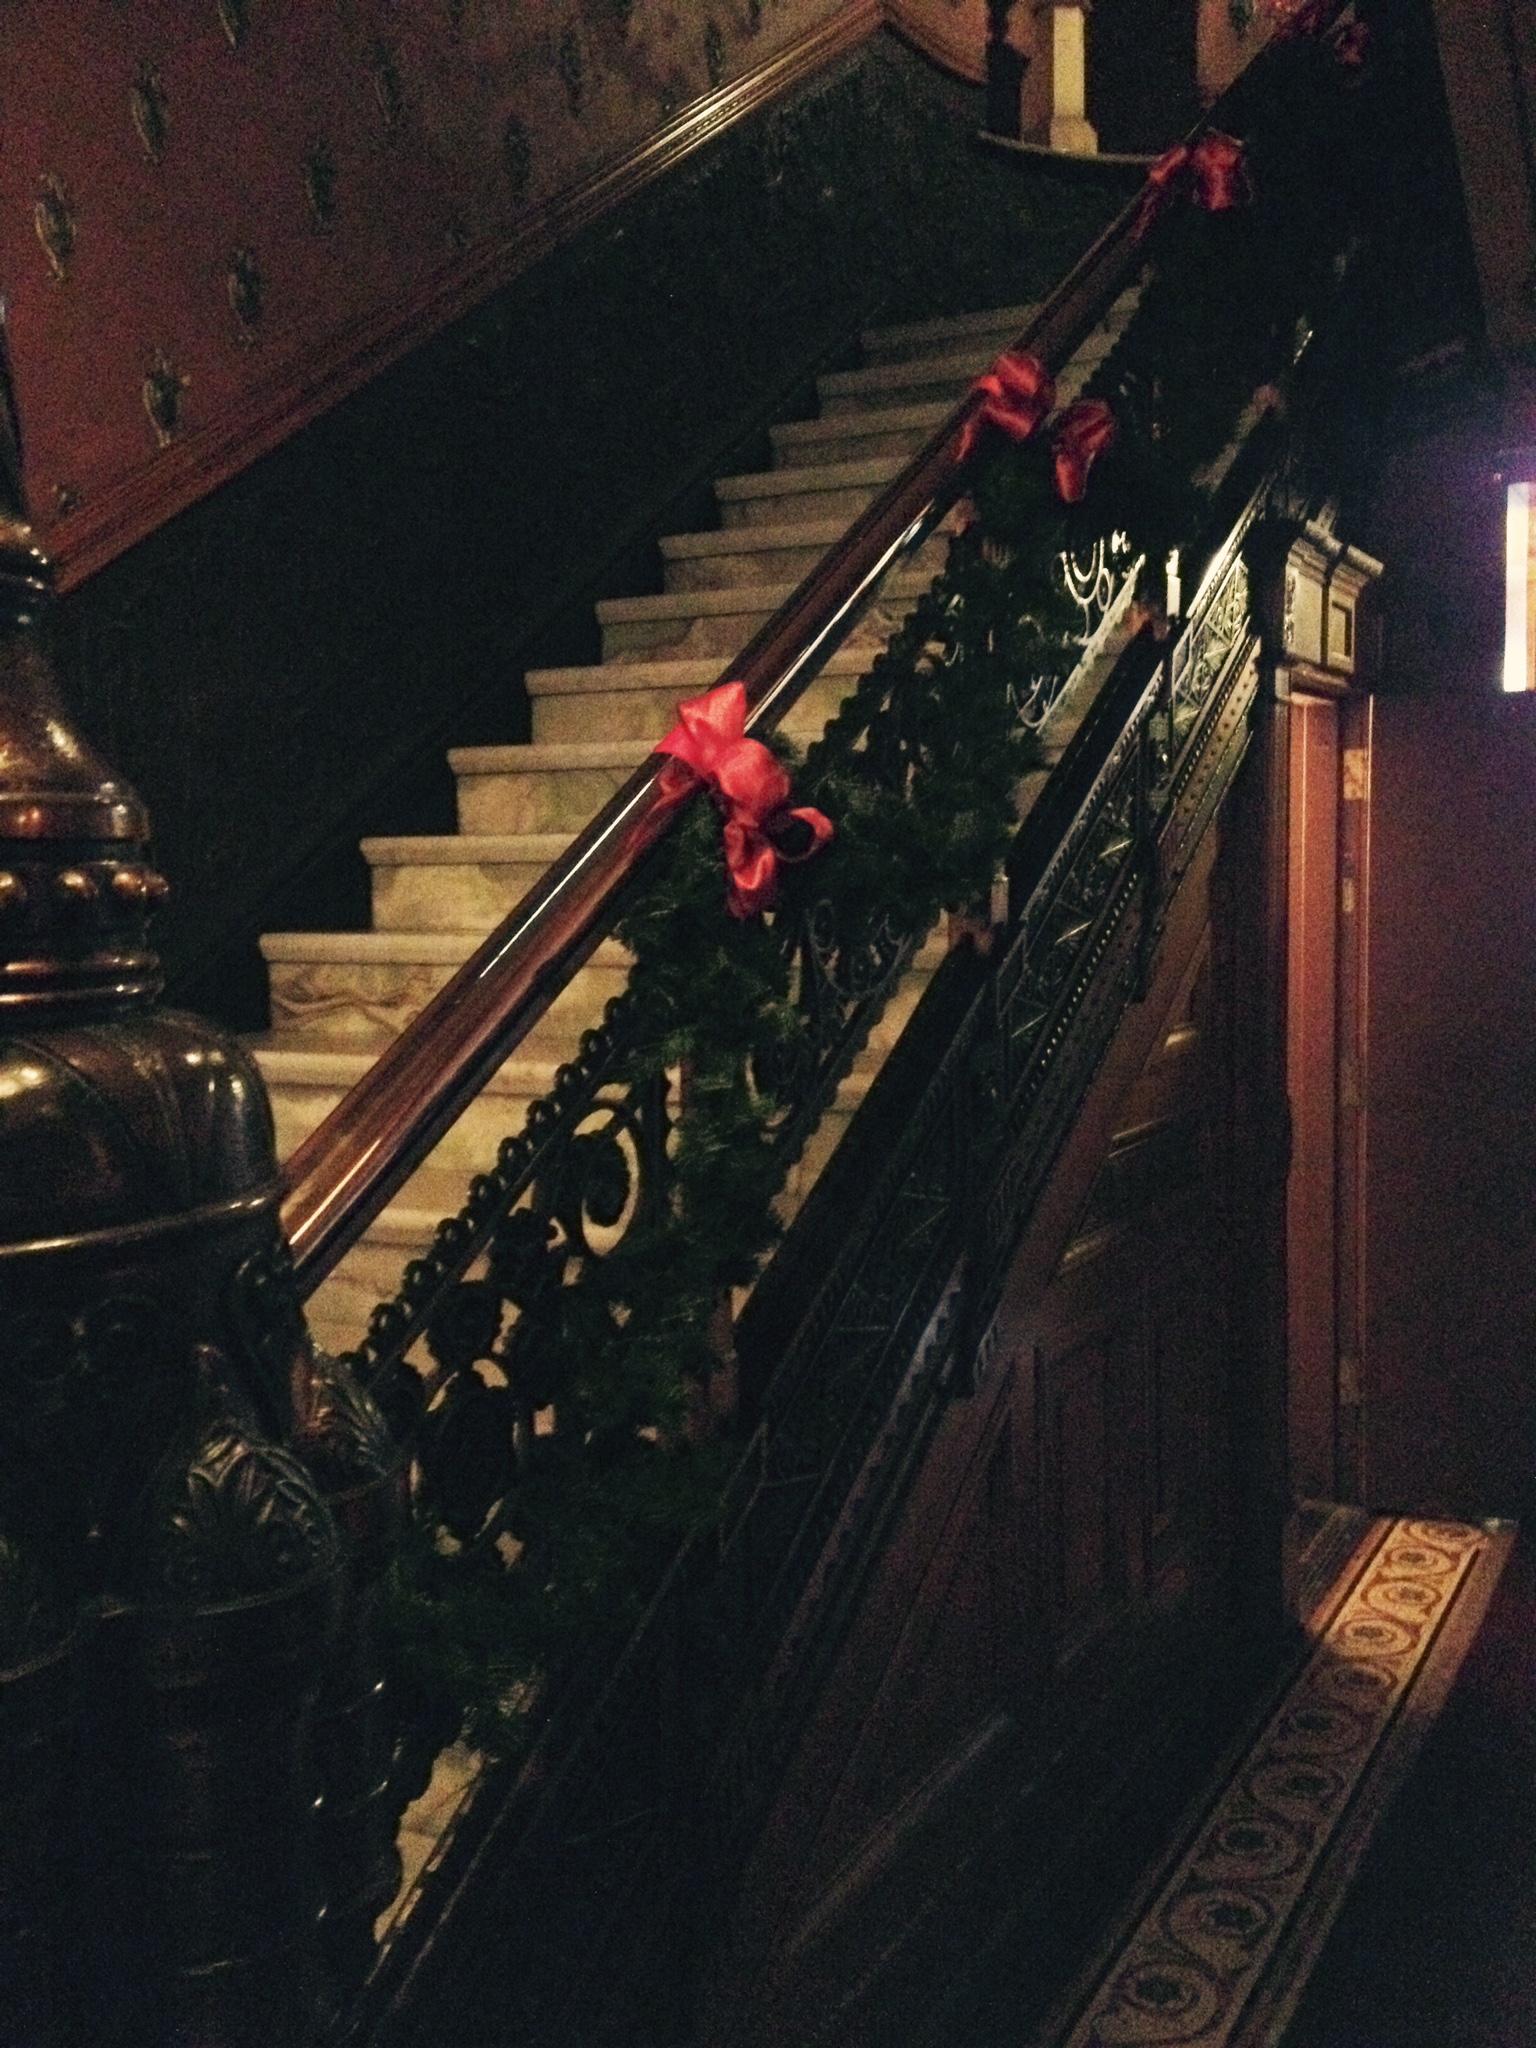 Christmas2015_StairRailing.jpg